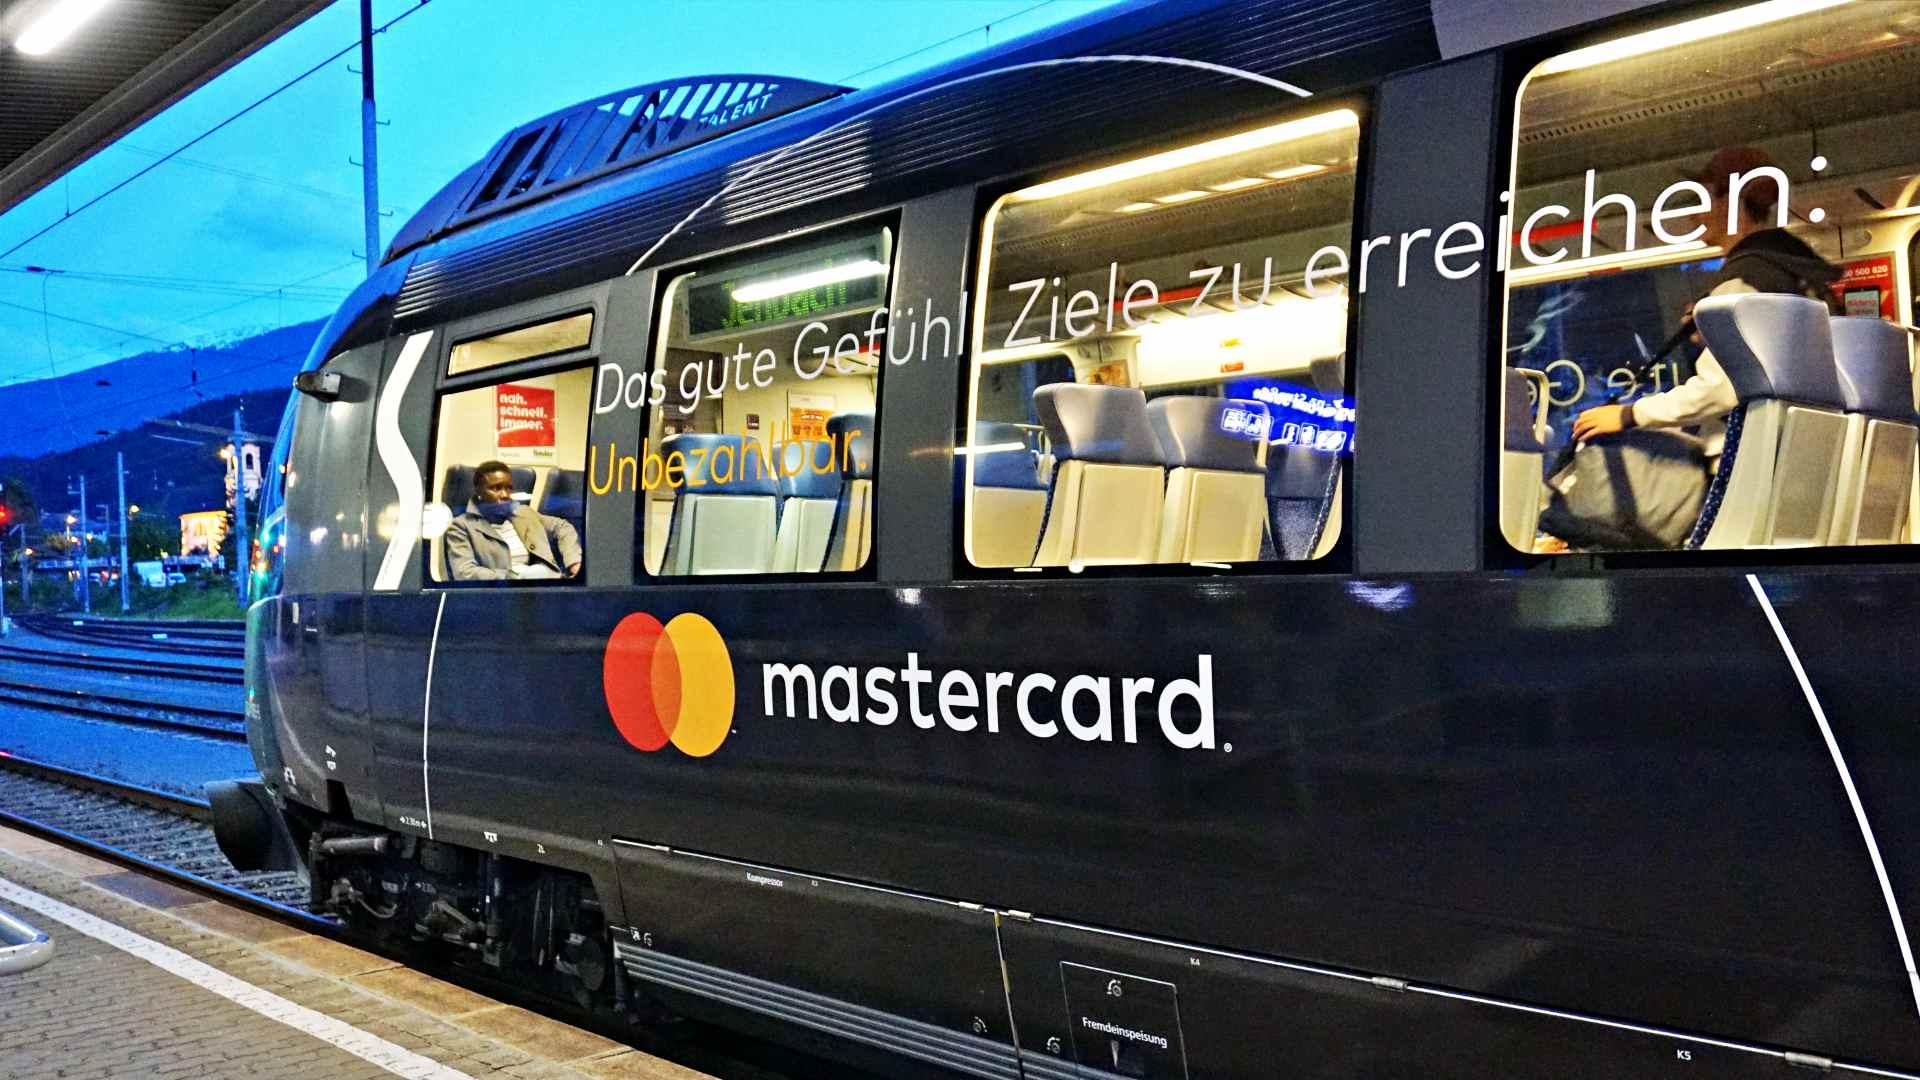 mastercard azonnali fizetes nets felvasarlas